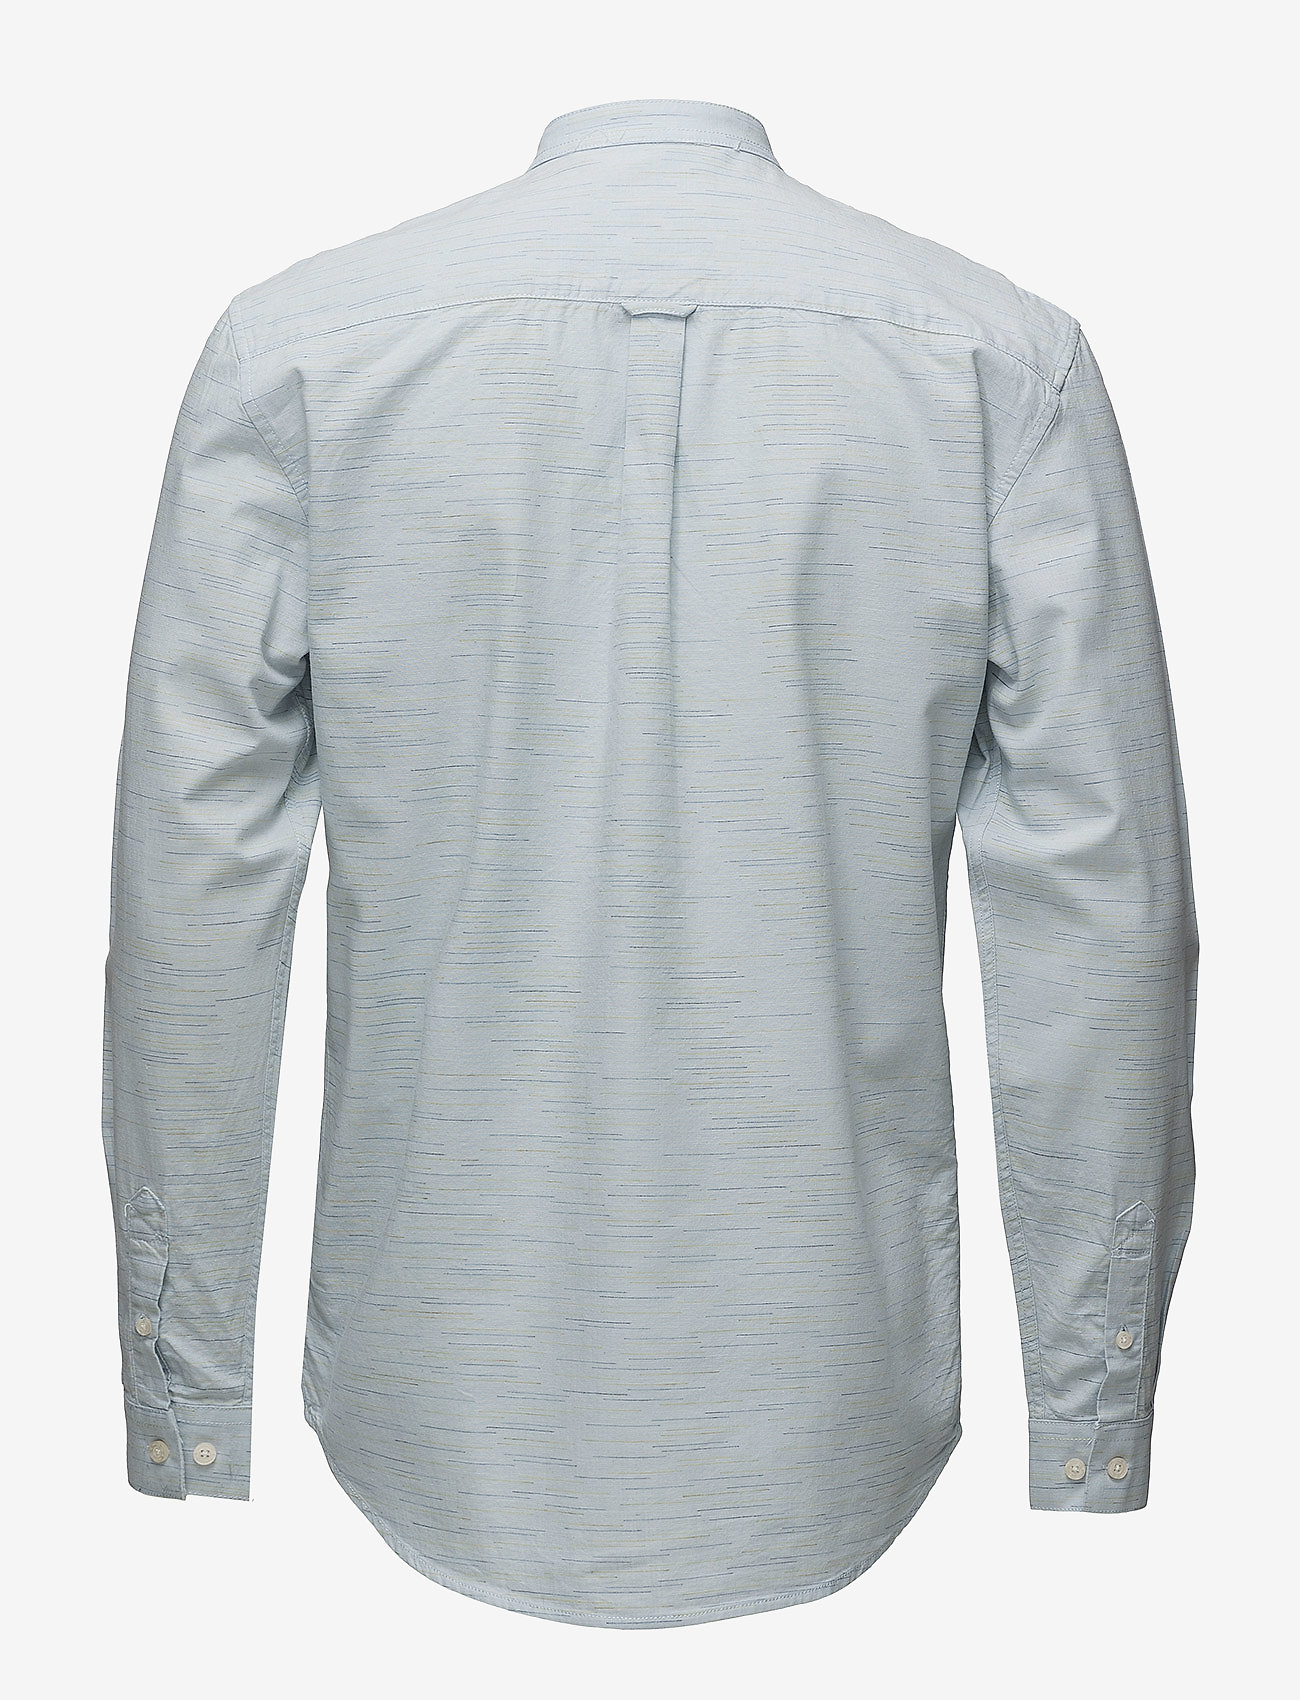 Minimum - odden - chemises shirts - soft blue mel